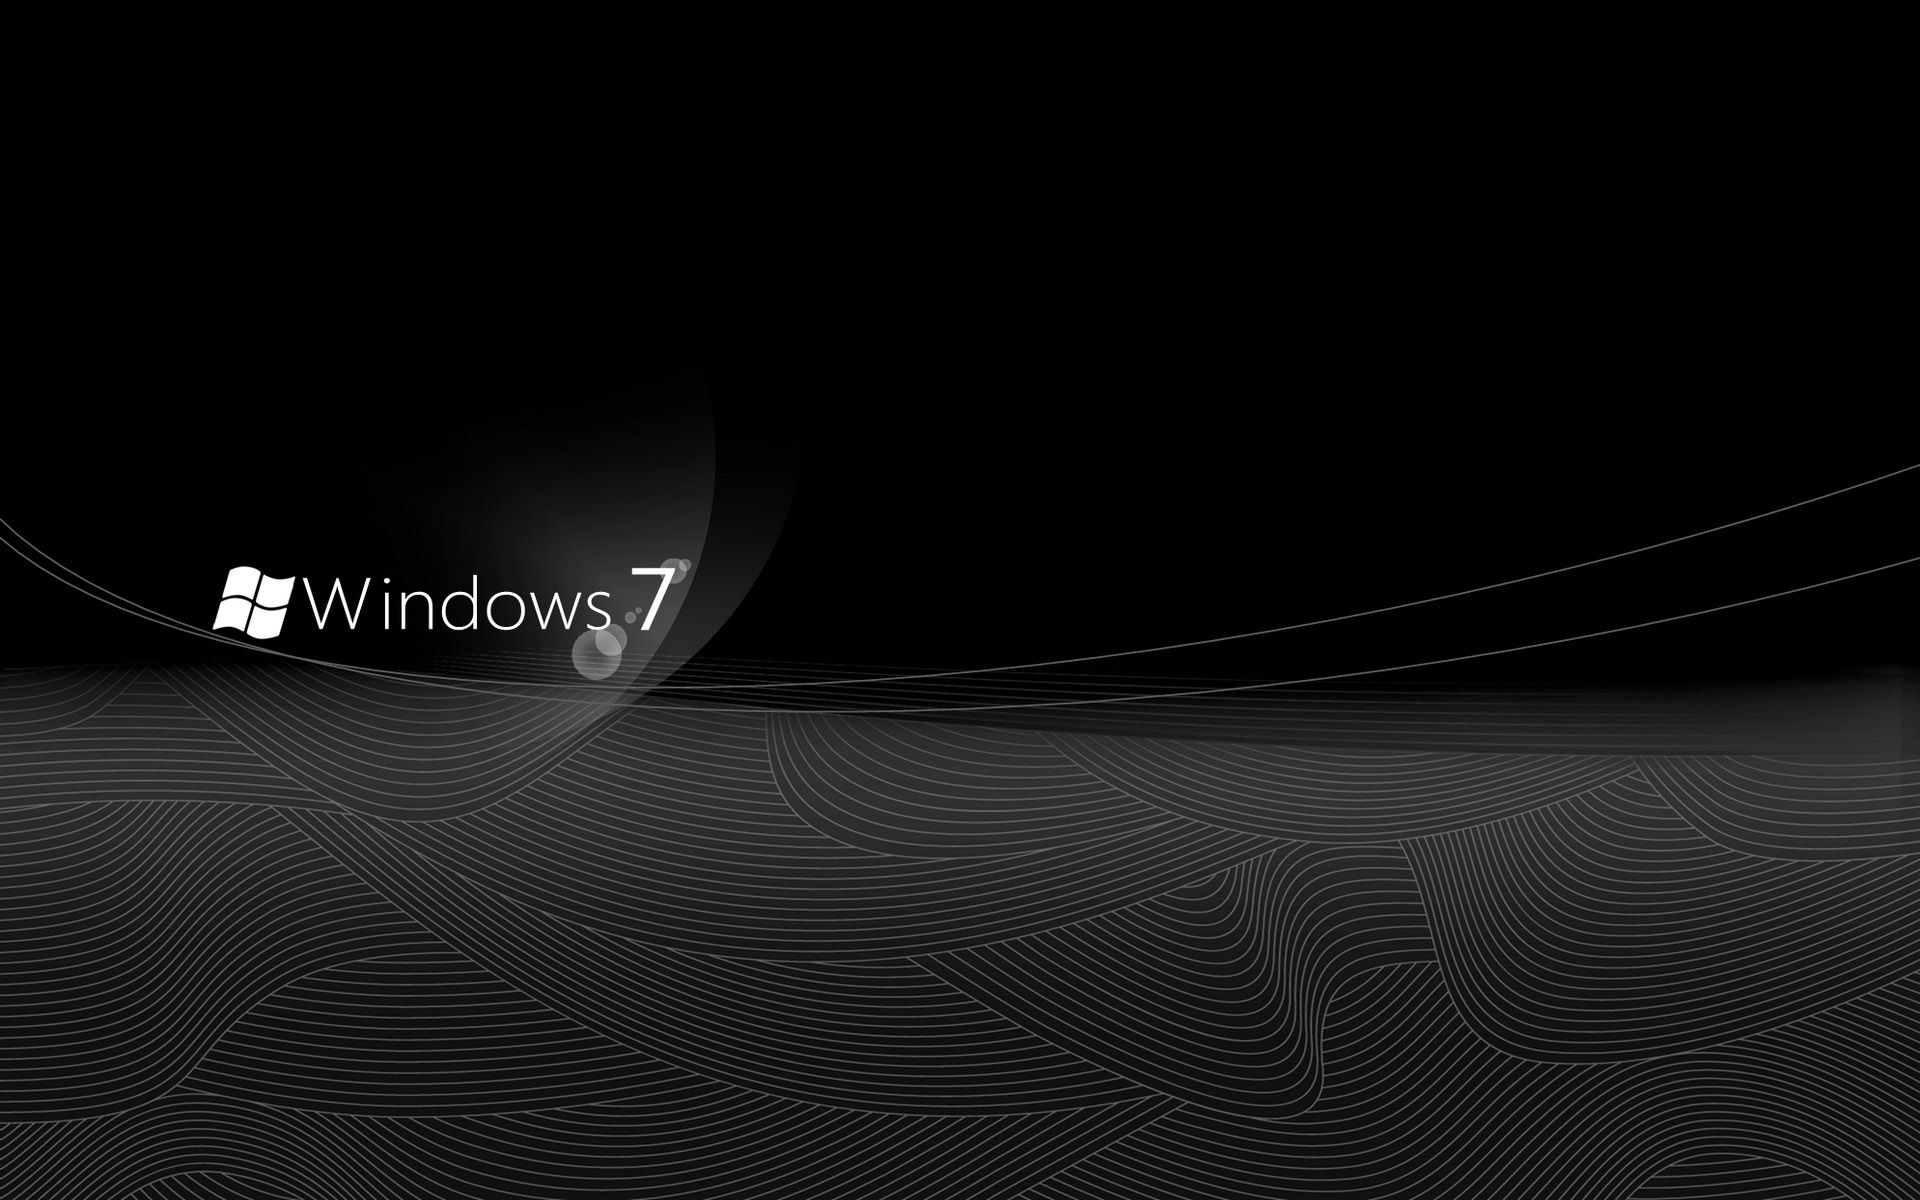 Black Windows 7 Wallpapers Hd Wallpaper Fonte Jardim